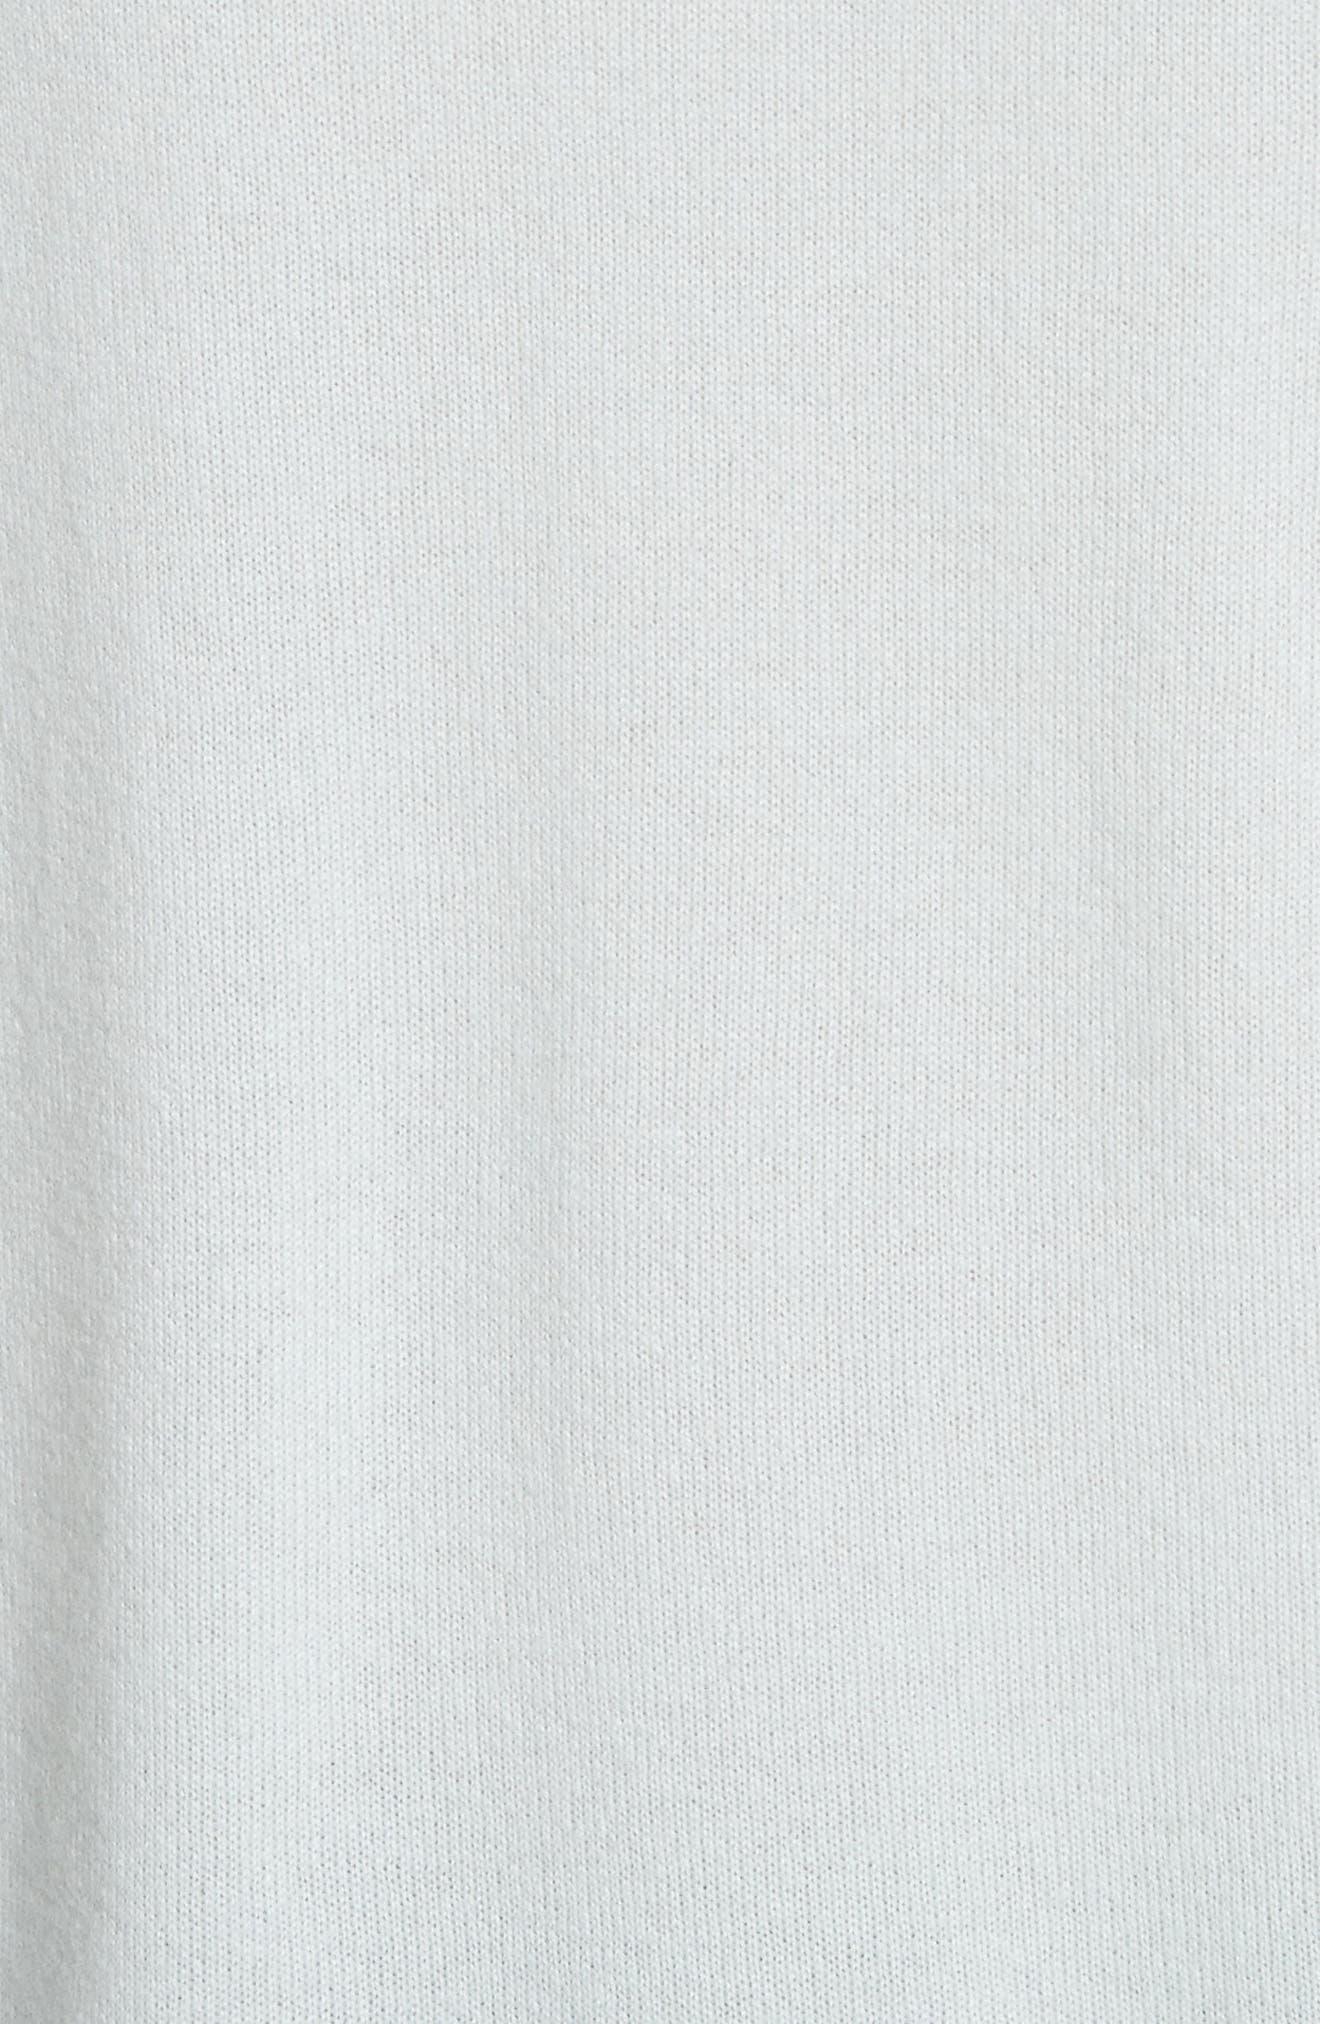 V-Neck Cashmere Sweater,                             Alternate thumbnail 9, color,